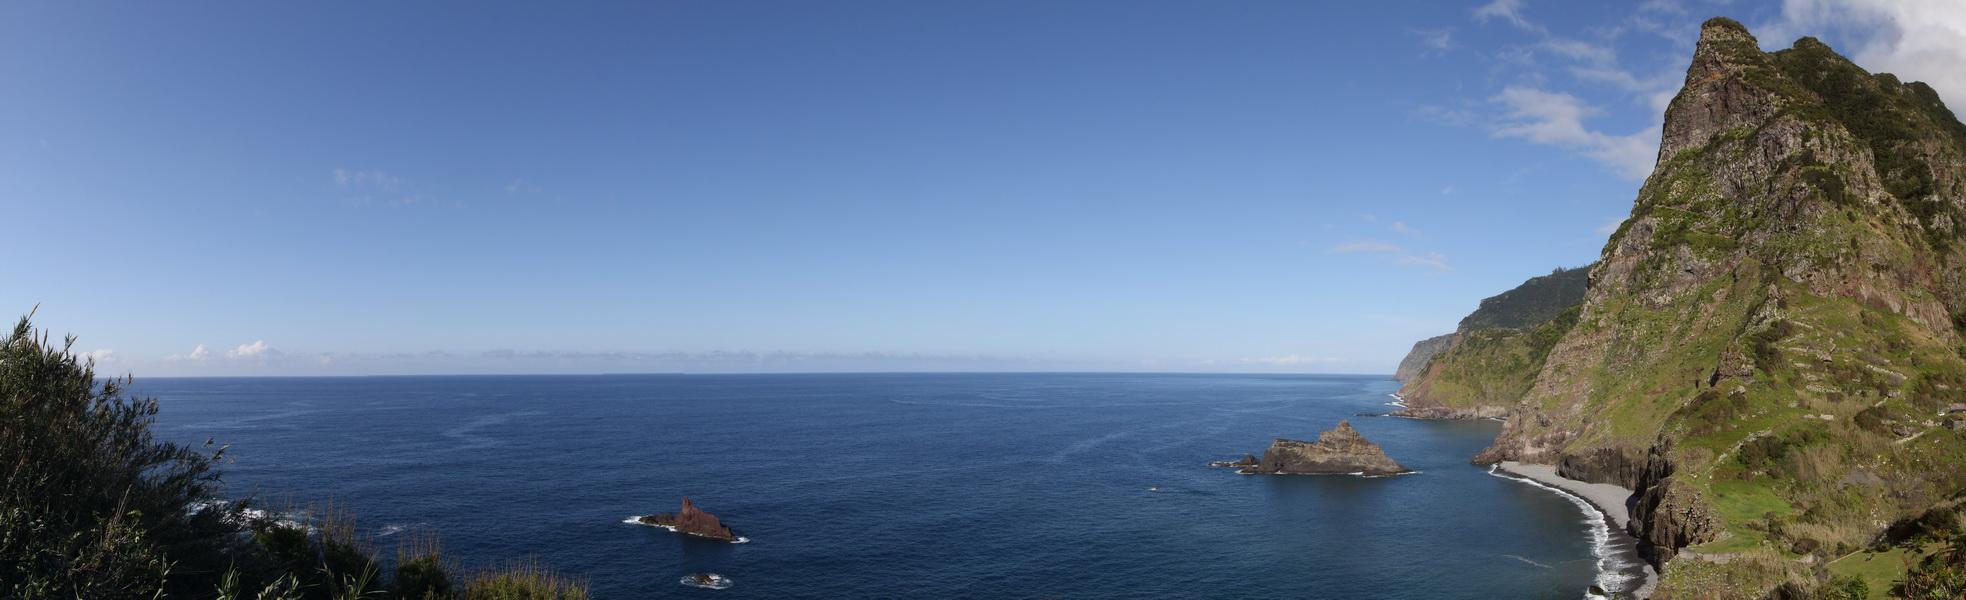 Steilküste bei Arco de Sao Jorge